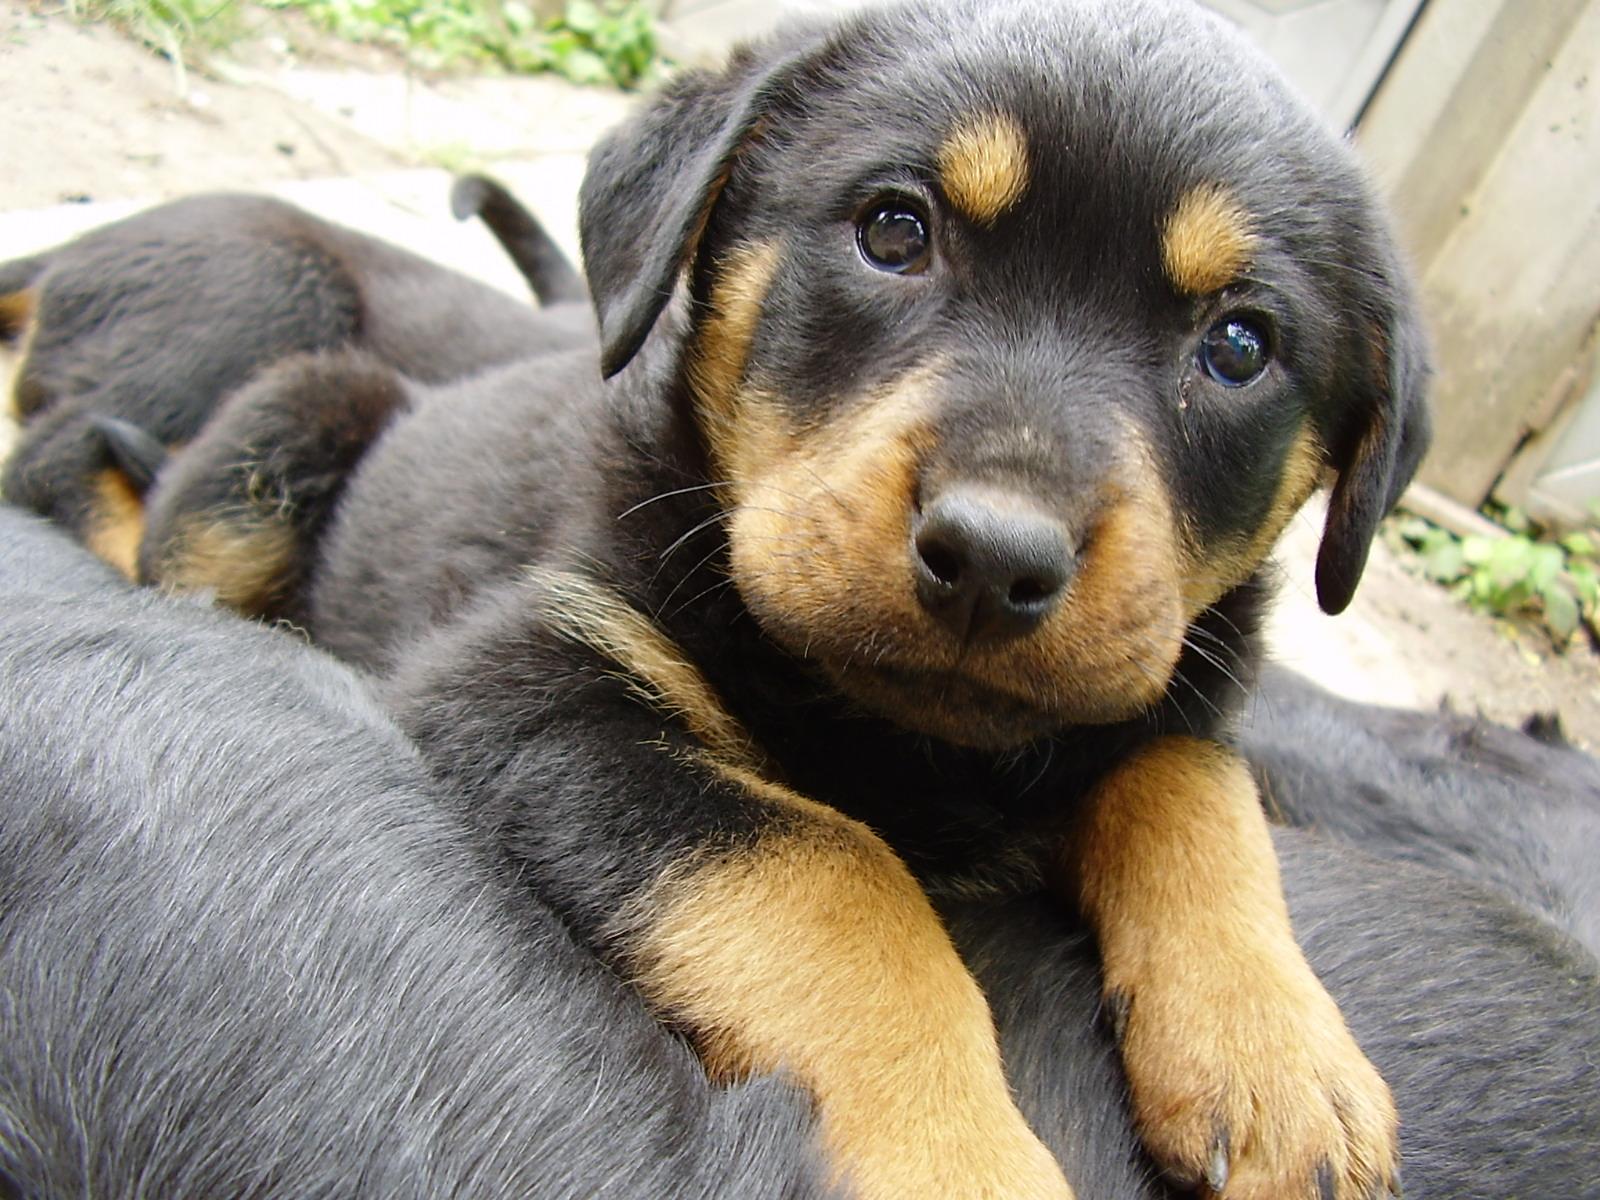 http://1.bp.blogspot.com/-HRV9SzvRVdk/Tz2_HPj9CII/AAAAAAAAHyE/K57D0eltV2Q/s1600/Rottweiler_Puppy_27390.jpg#rotties%20eyes%20gifs%201600x1200